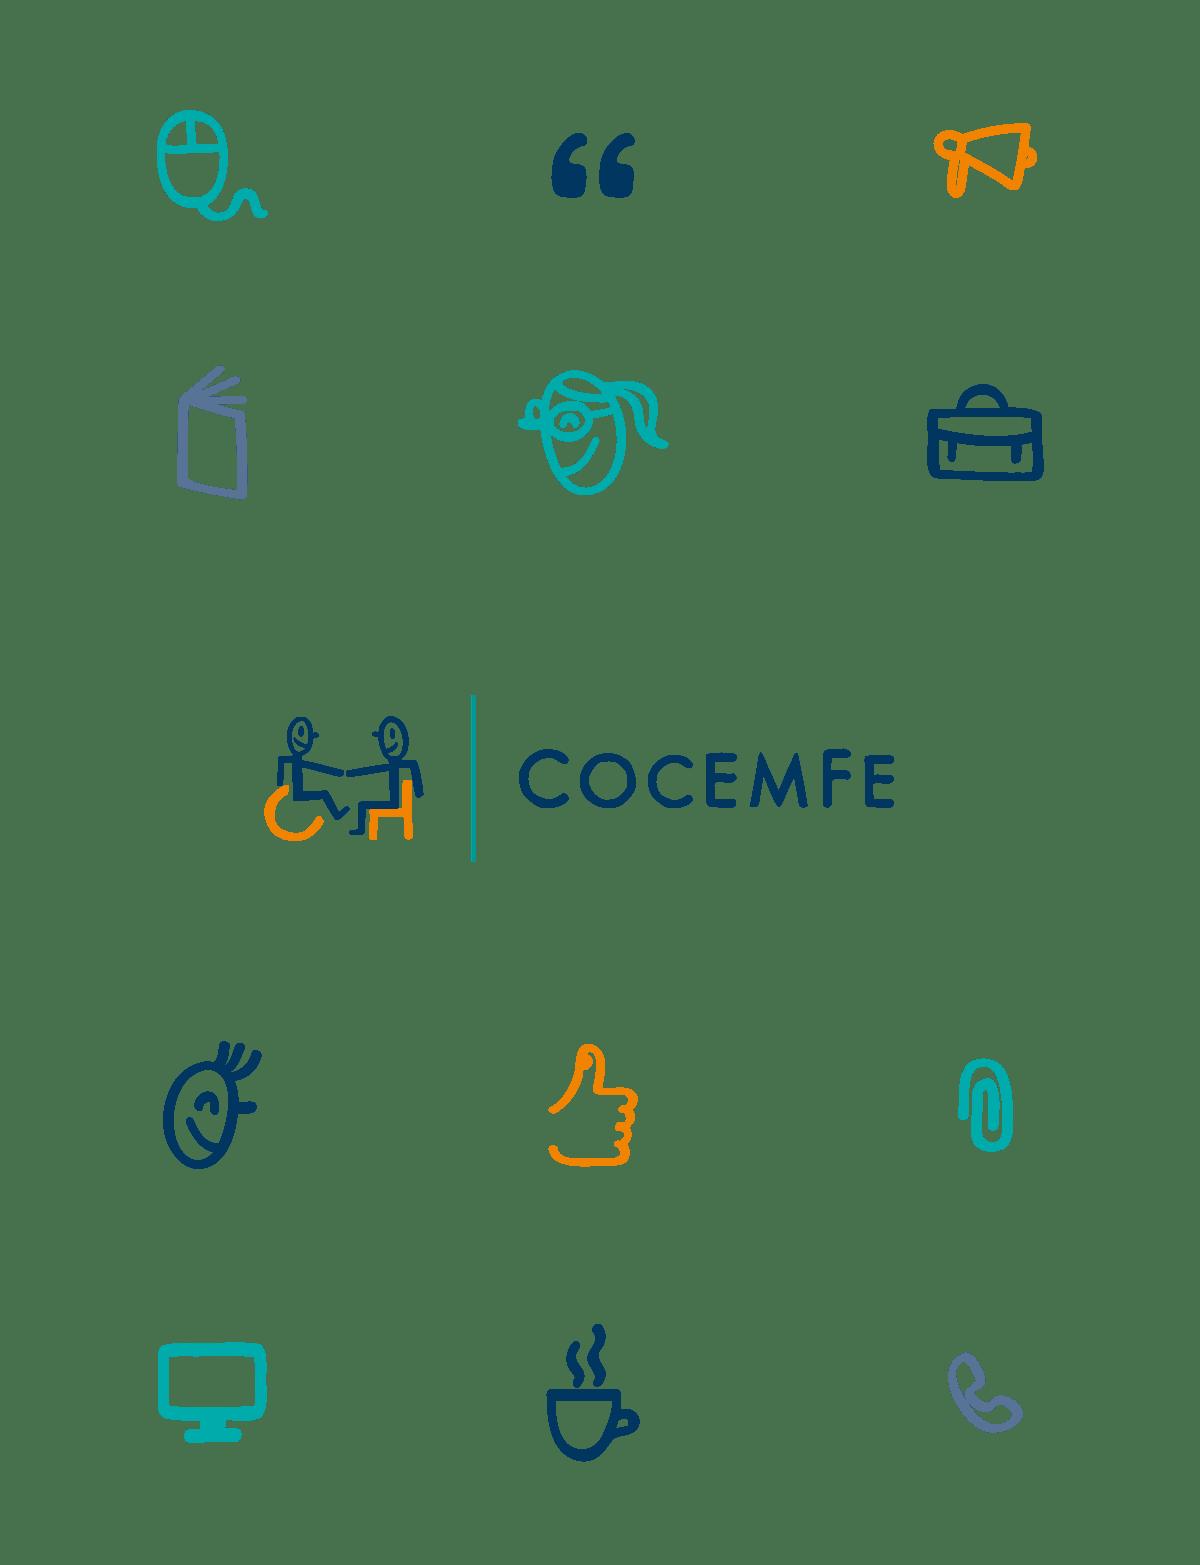 COCEMFE